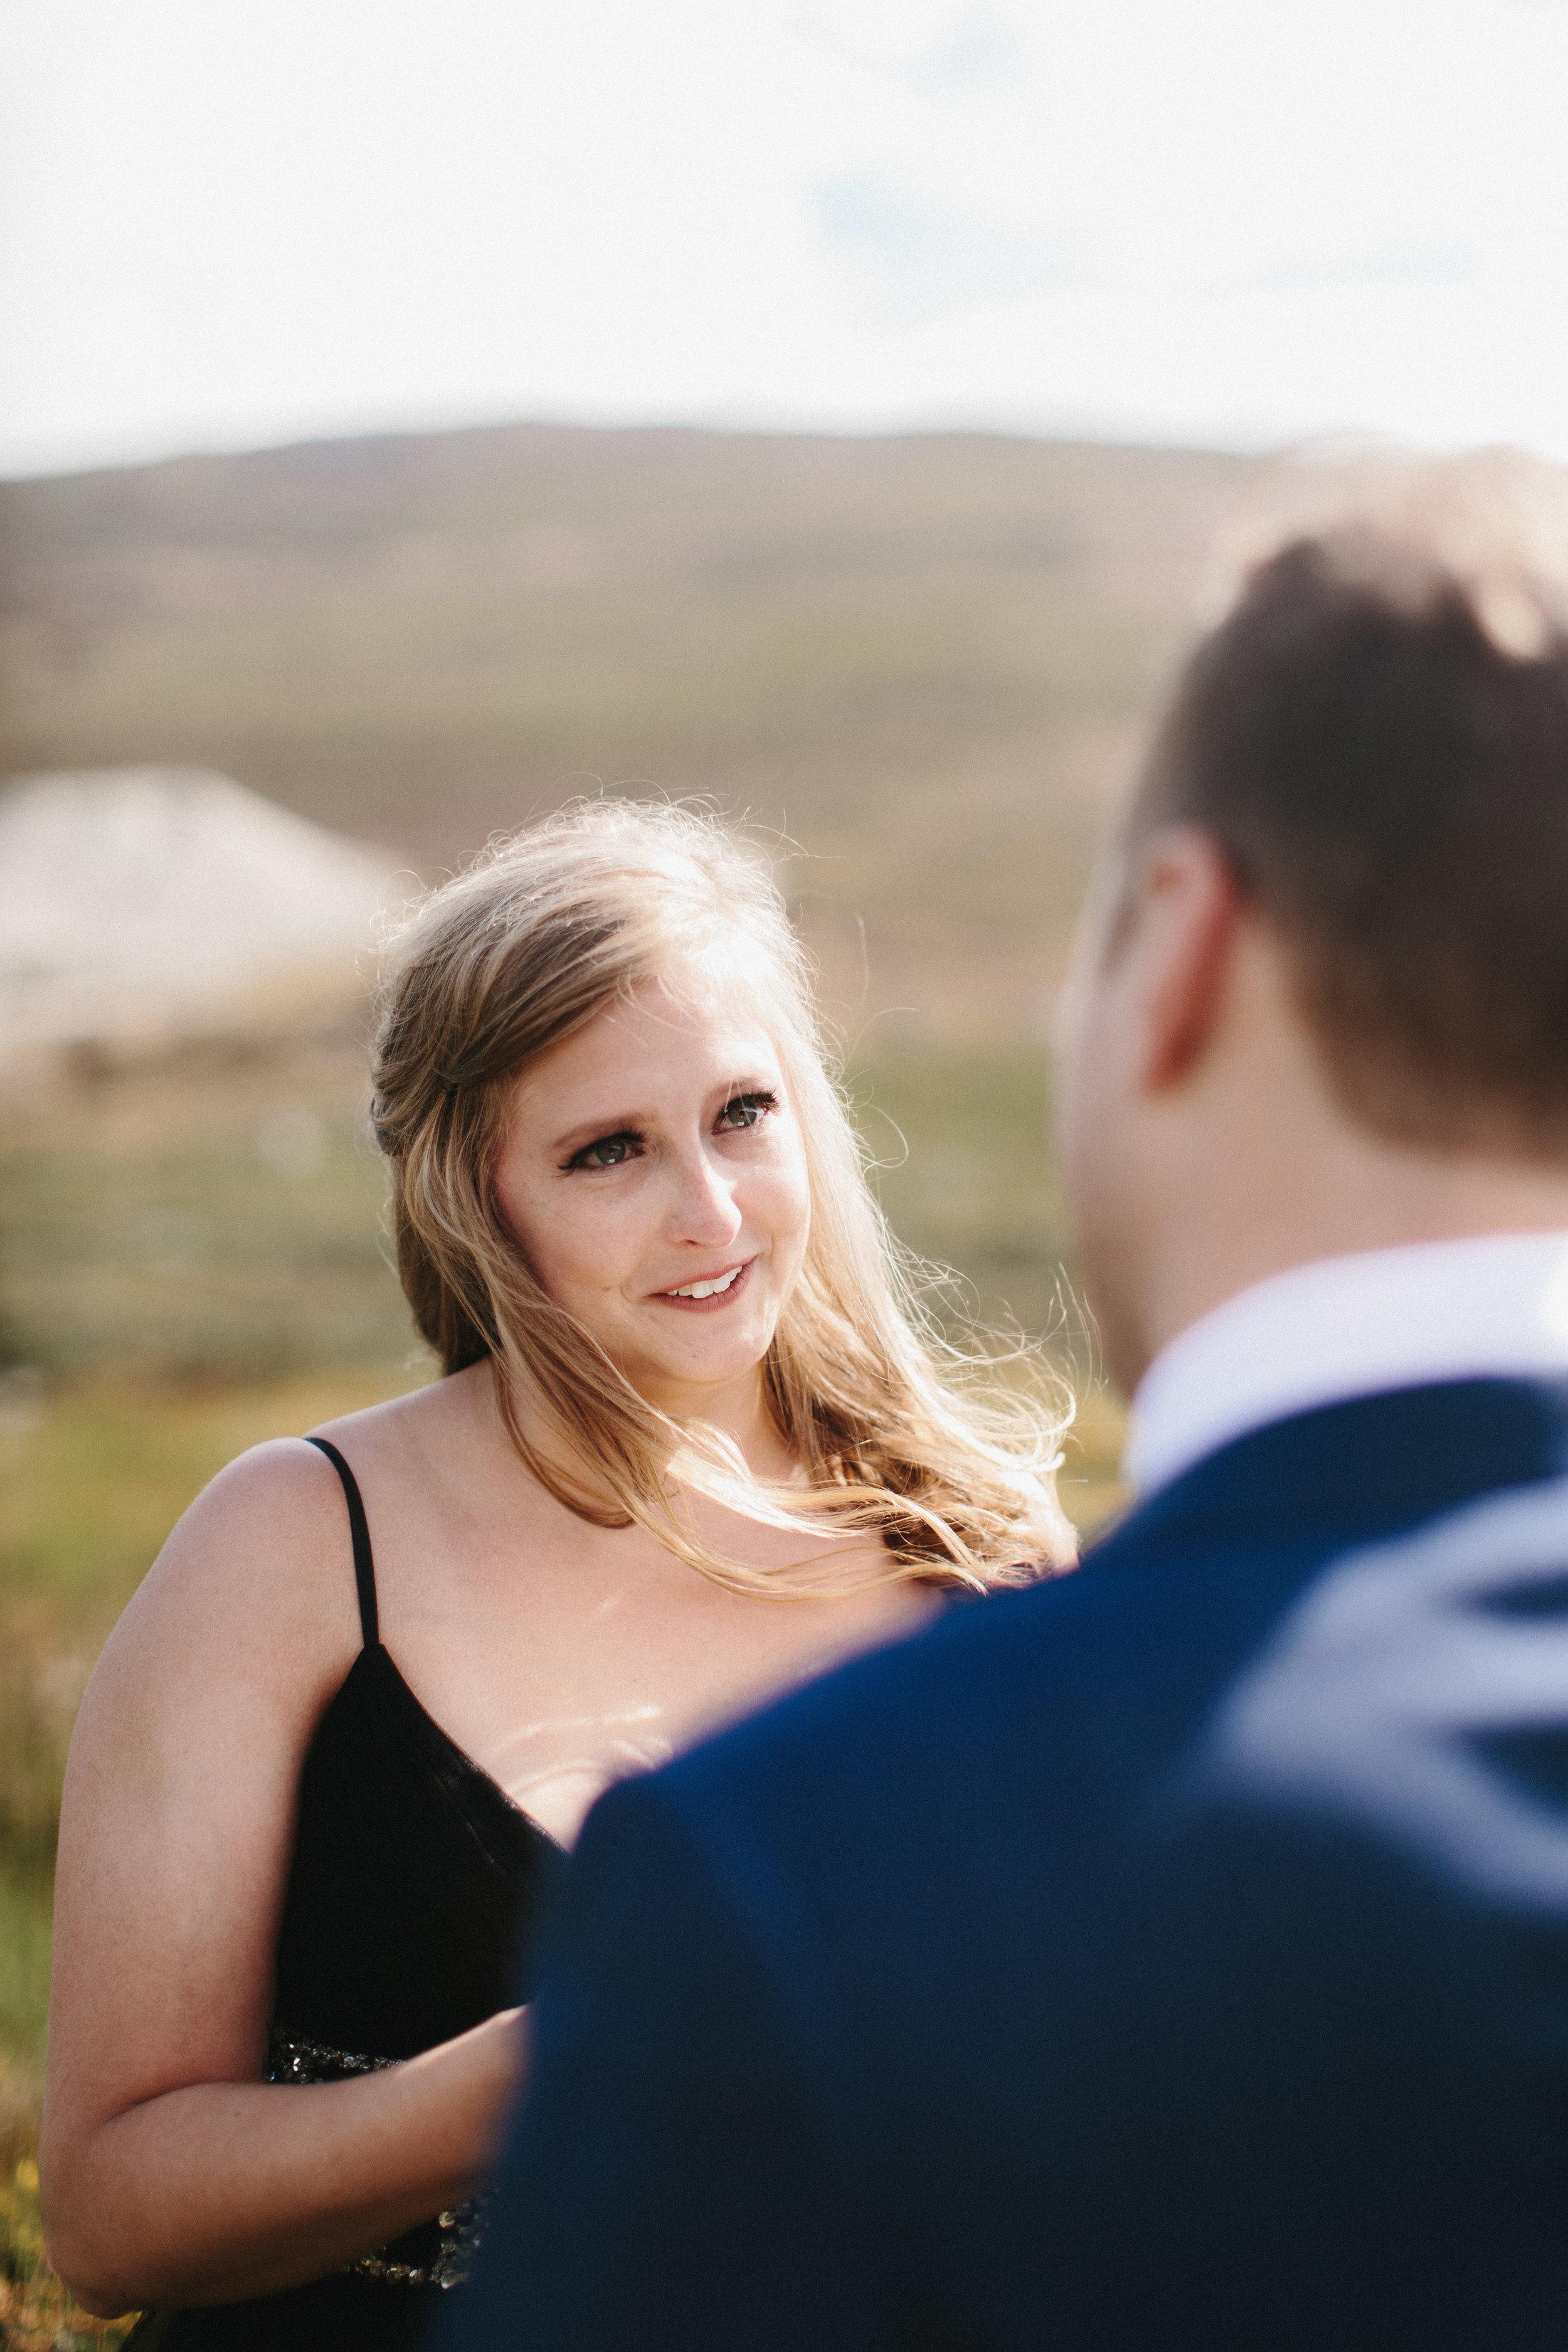 ireland_elopement_black_wedding_dress_wicklow_glendalough_athy_st_kevins_way_1187.jpg